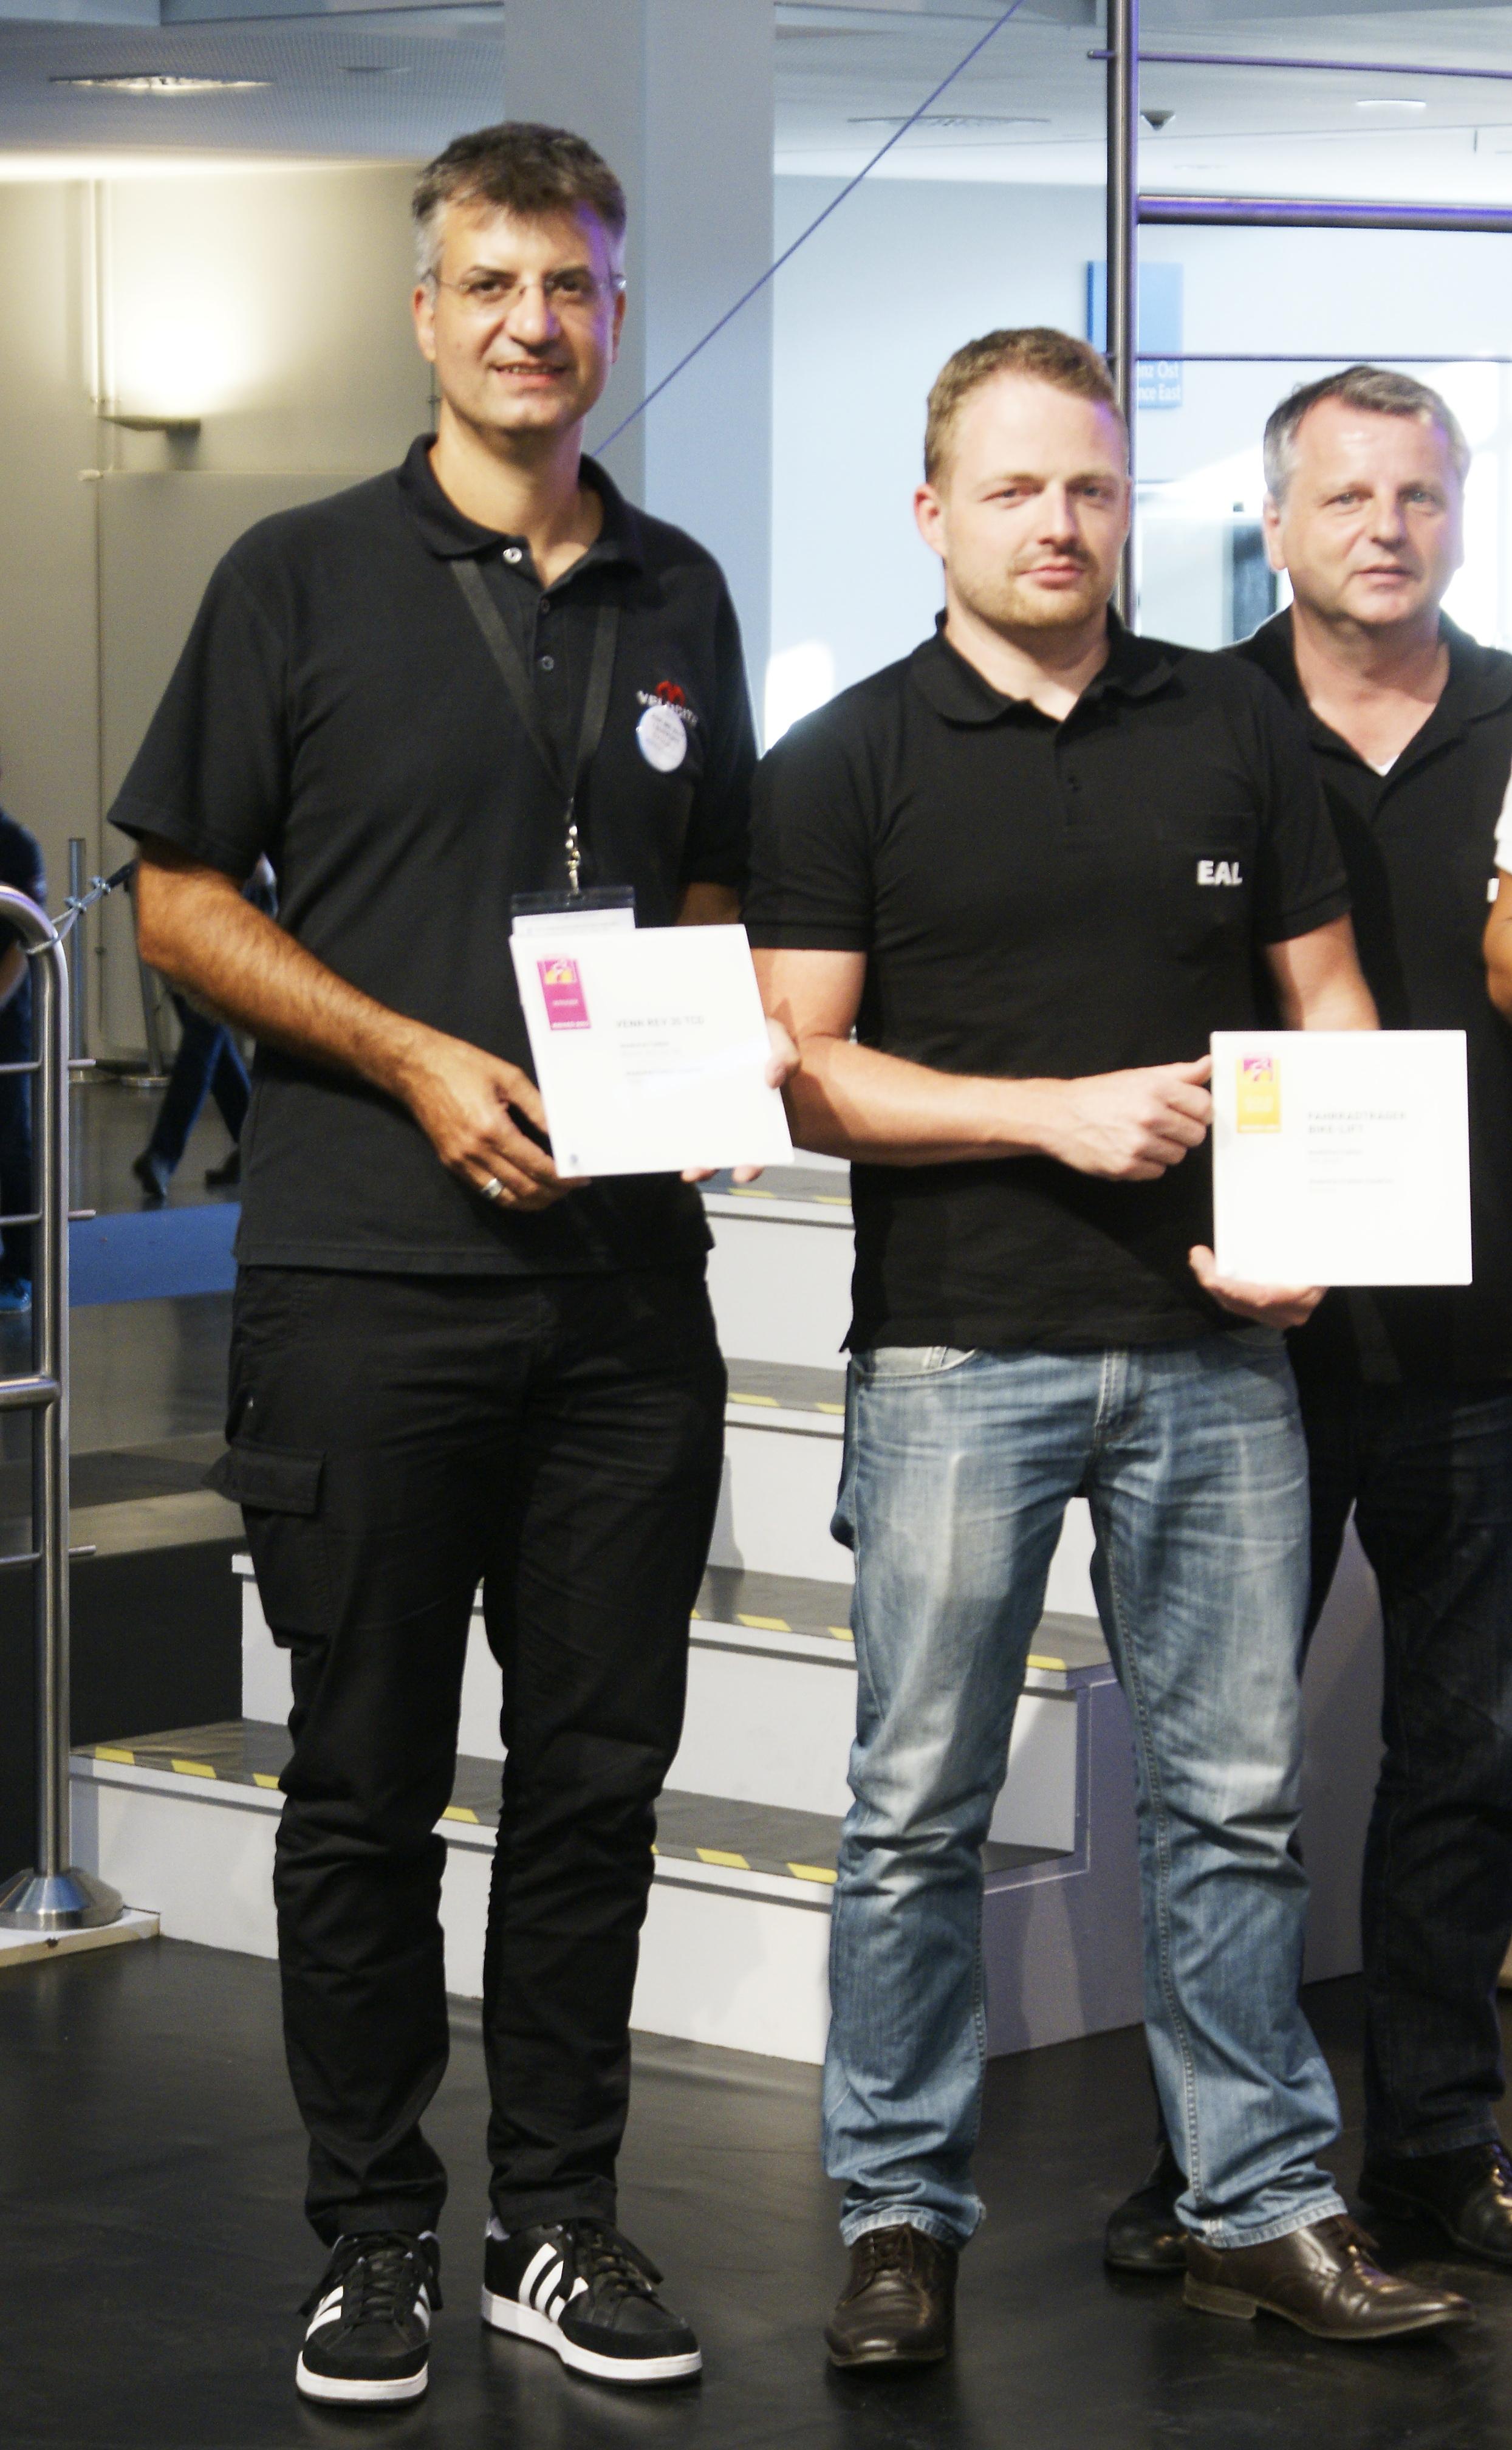 Victor Major winner of best product at Eurobike 2015 for his Venn REV Carbon wheels.